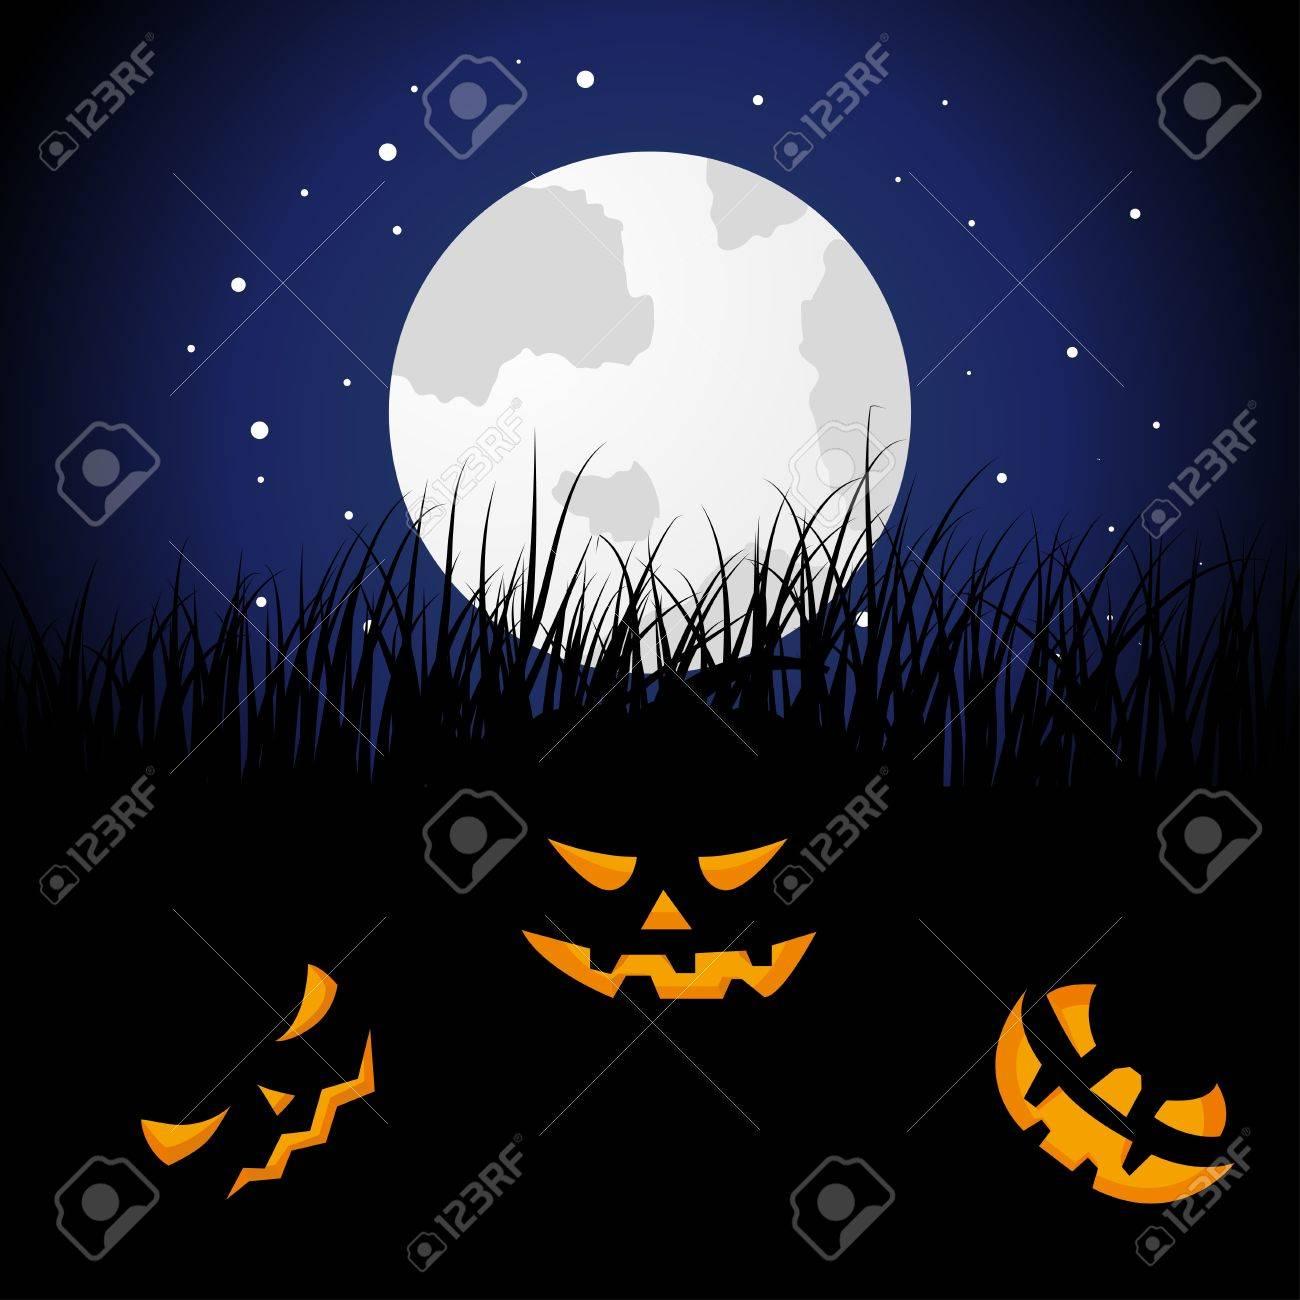 Happy halloween theme greeting card. illustration. Stock Vector - 15315210